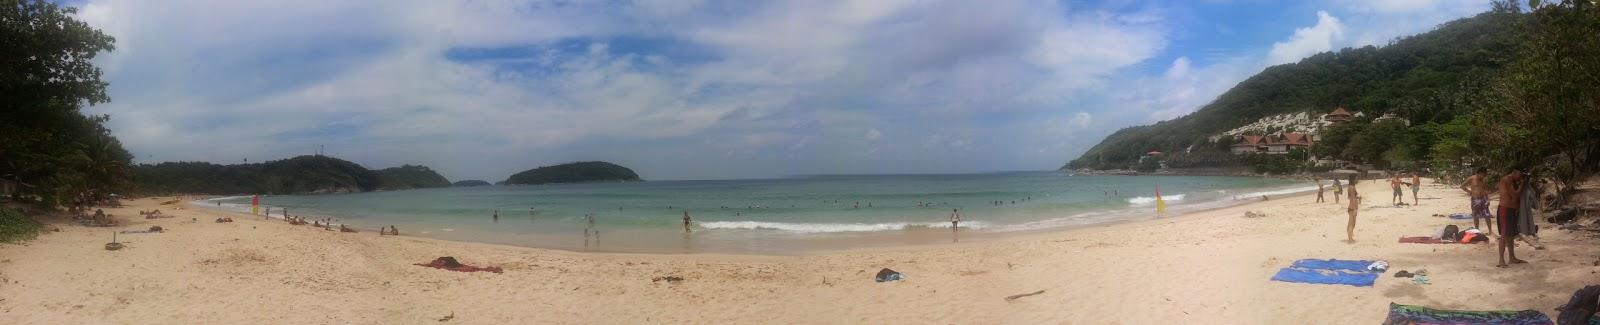 Image of Nai harn Beach - Phuket